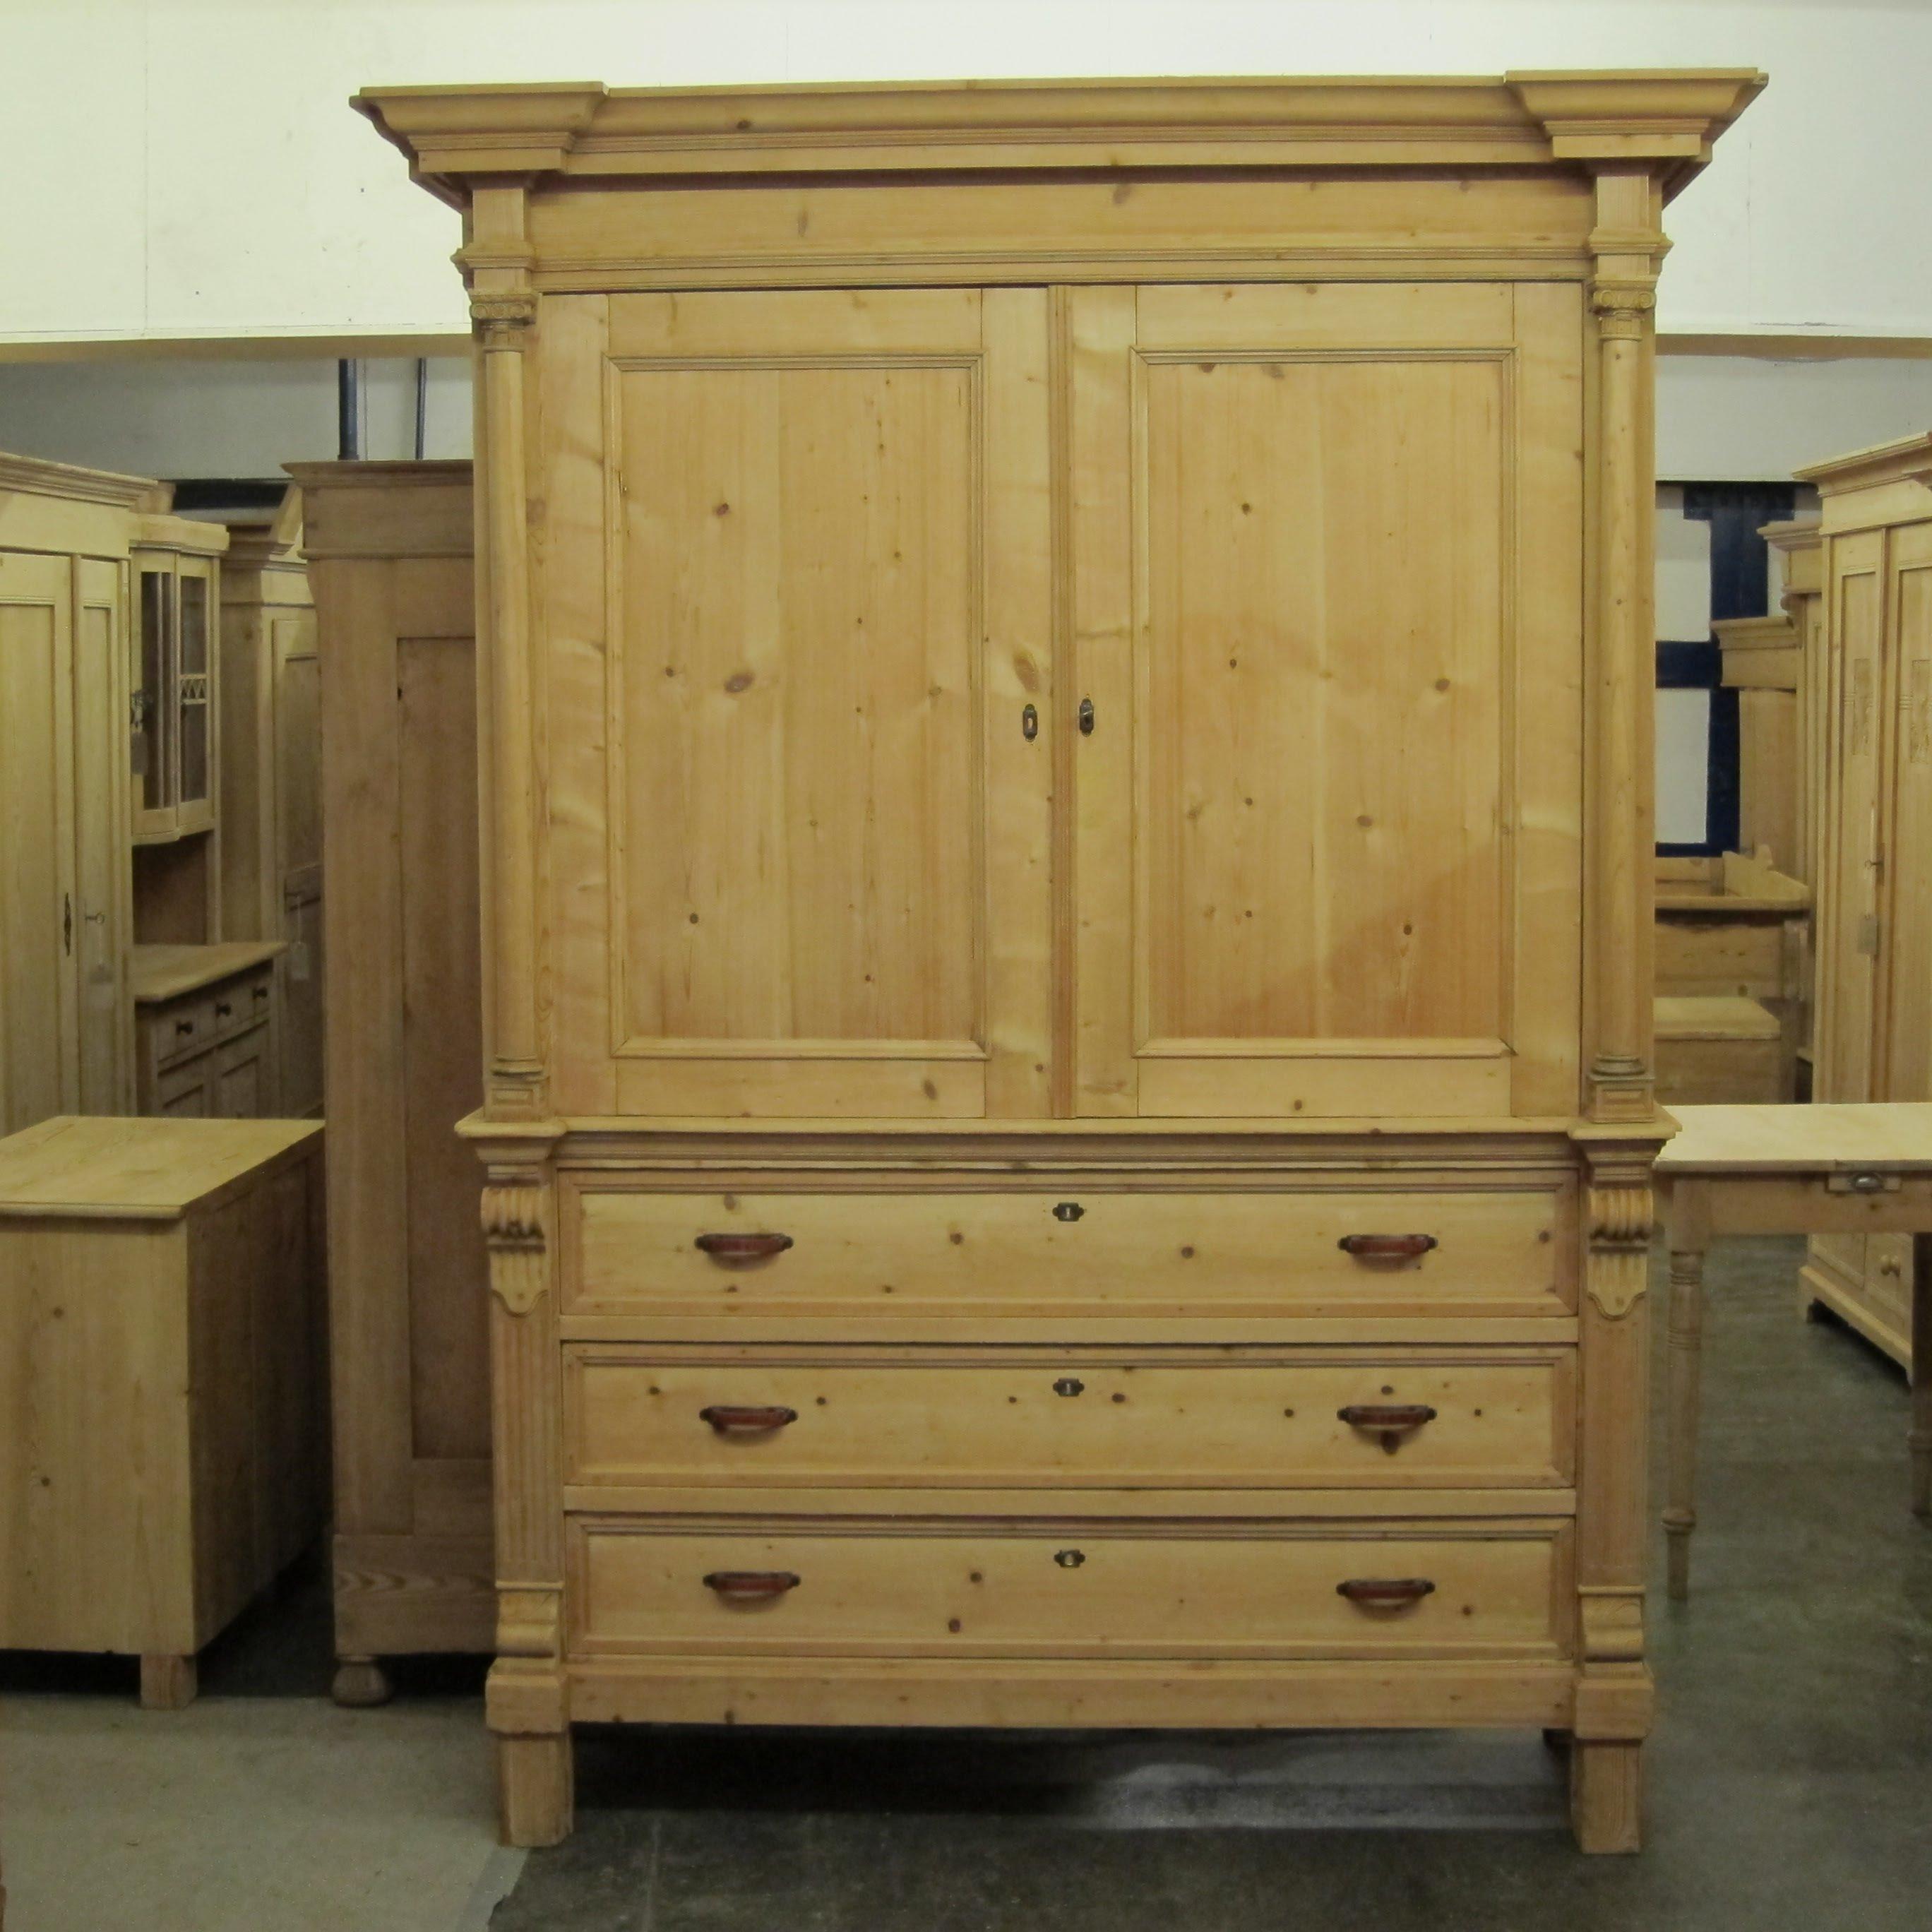 Elegant Very large antique pine linen press - Pinefinders Old Pine Furniture antique pine furniture